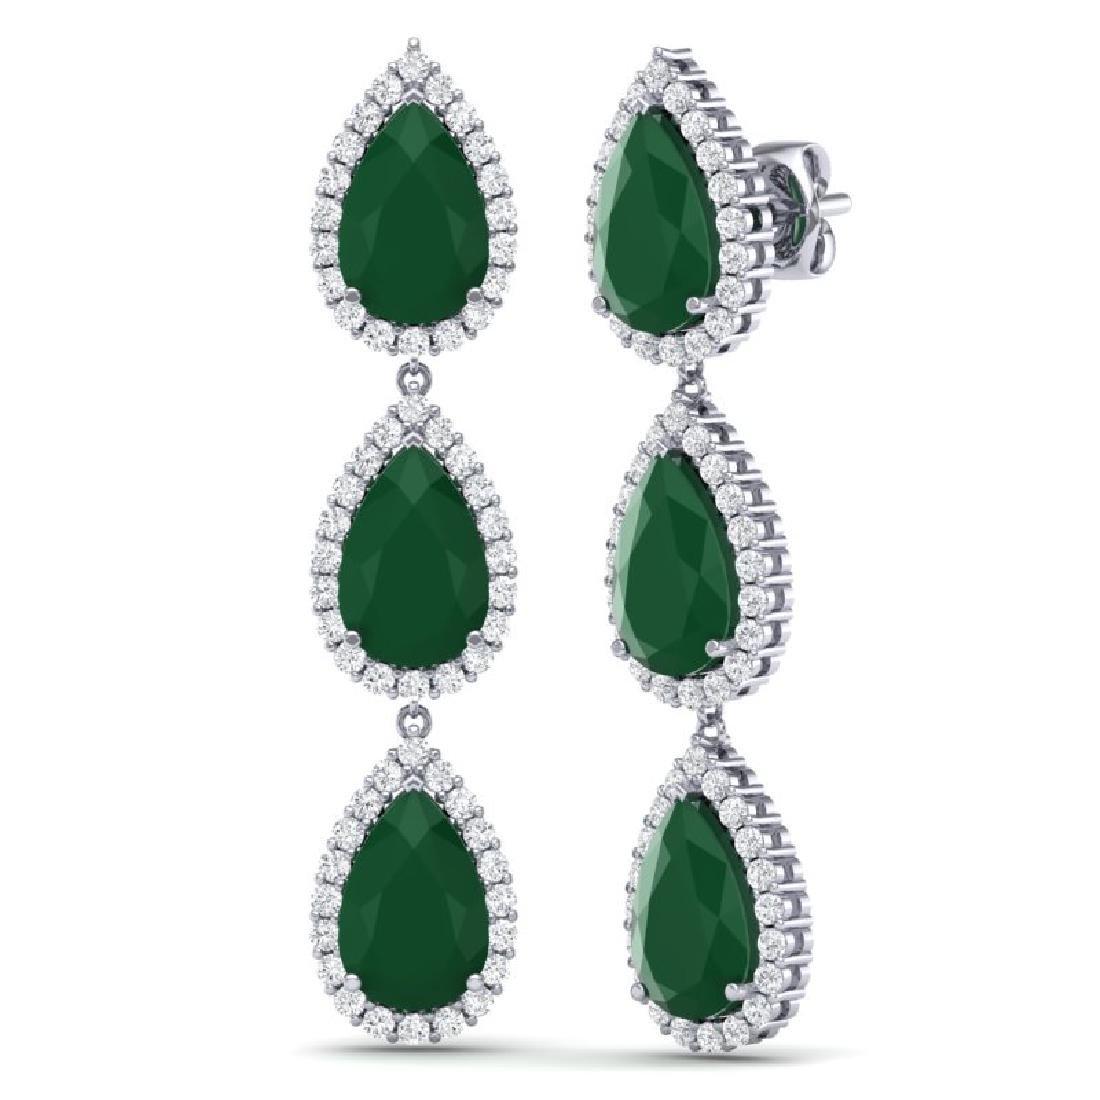 27.06 CTW Royalty Emerald & VS Diamond Earrings 18K - 2